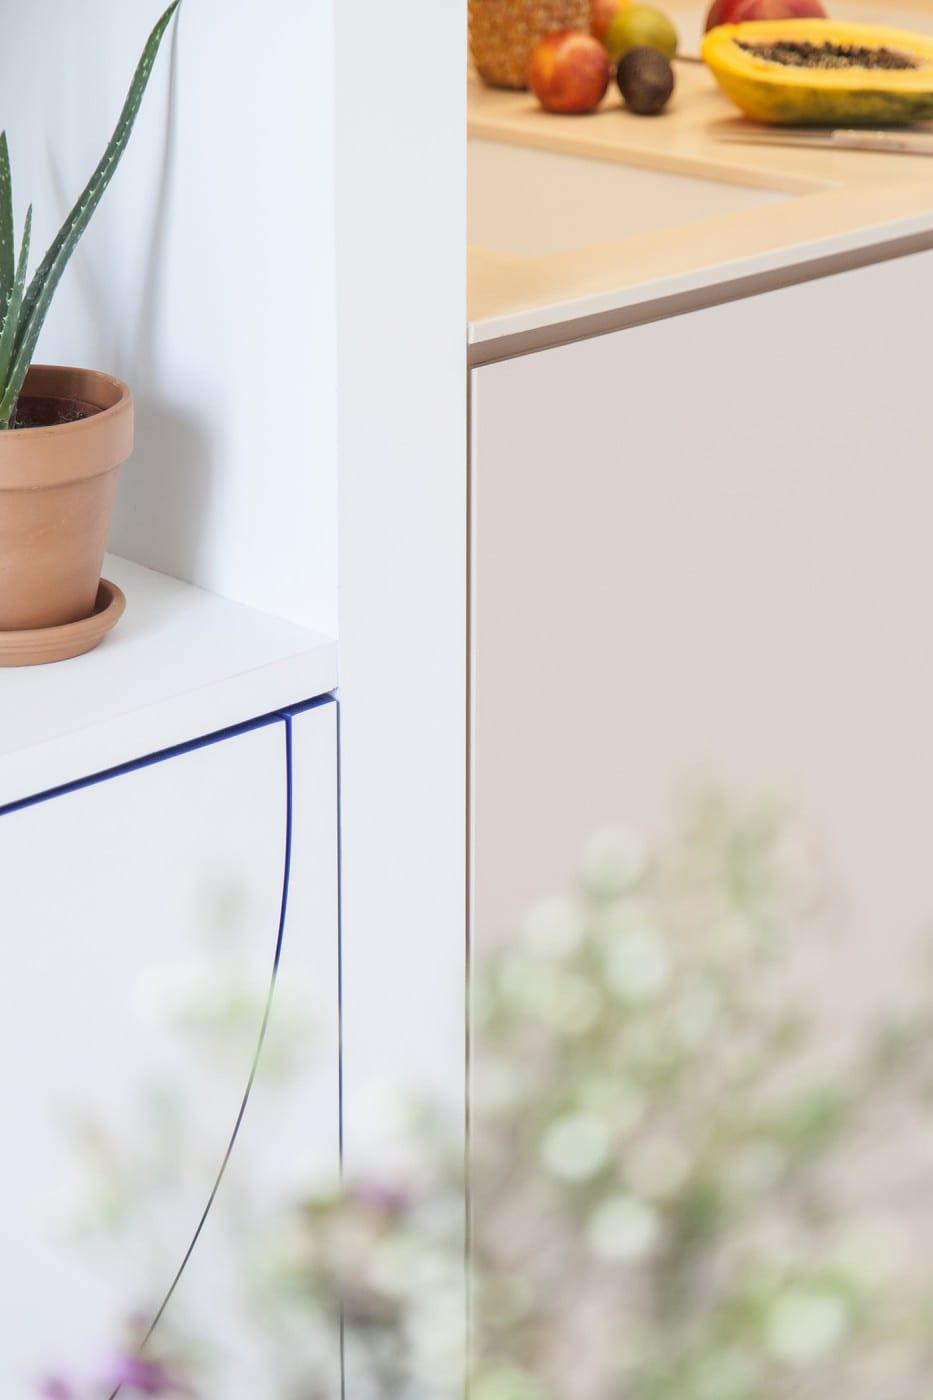 Micro Living: 11-square-metre Apartment in Paris by Batiik Studio | Yellowtrace